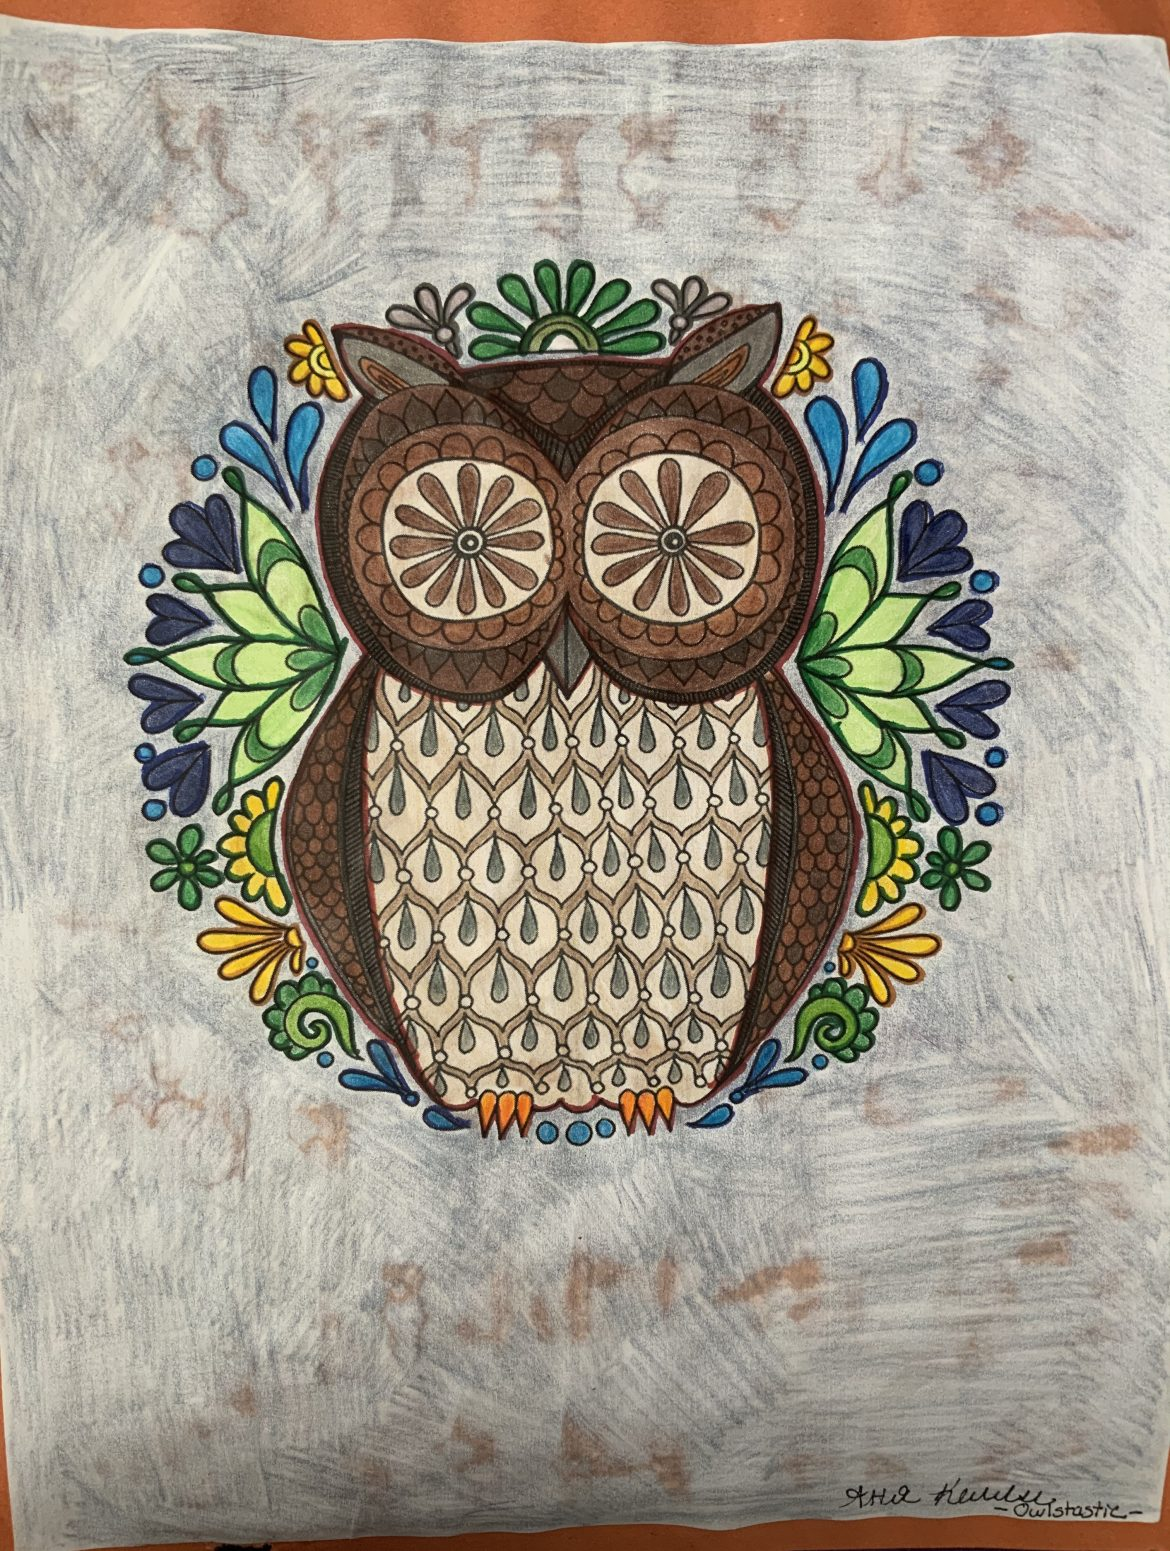 Owlstastic!